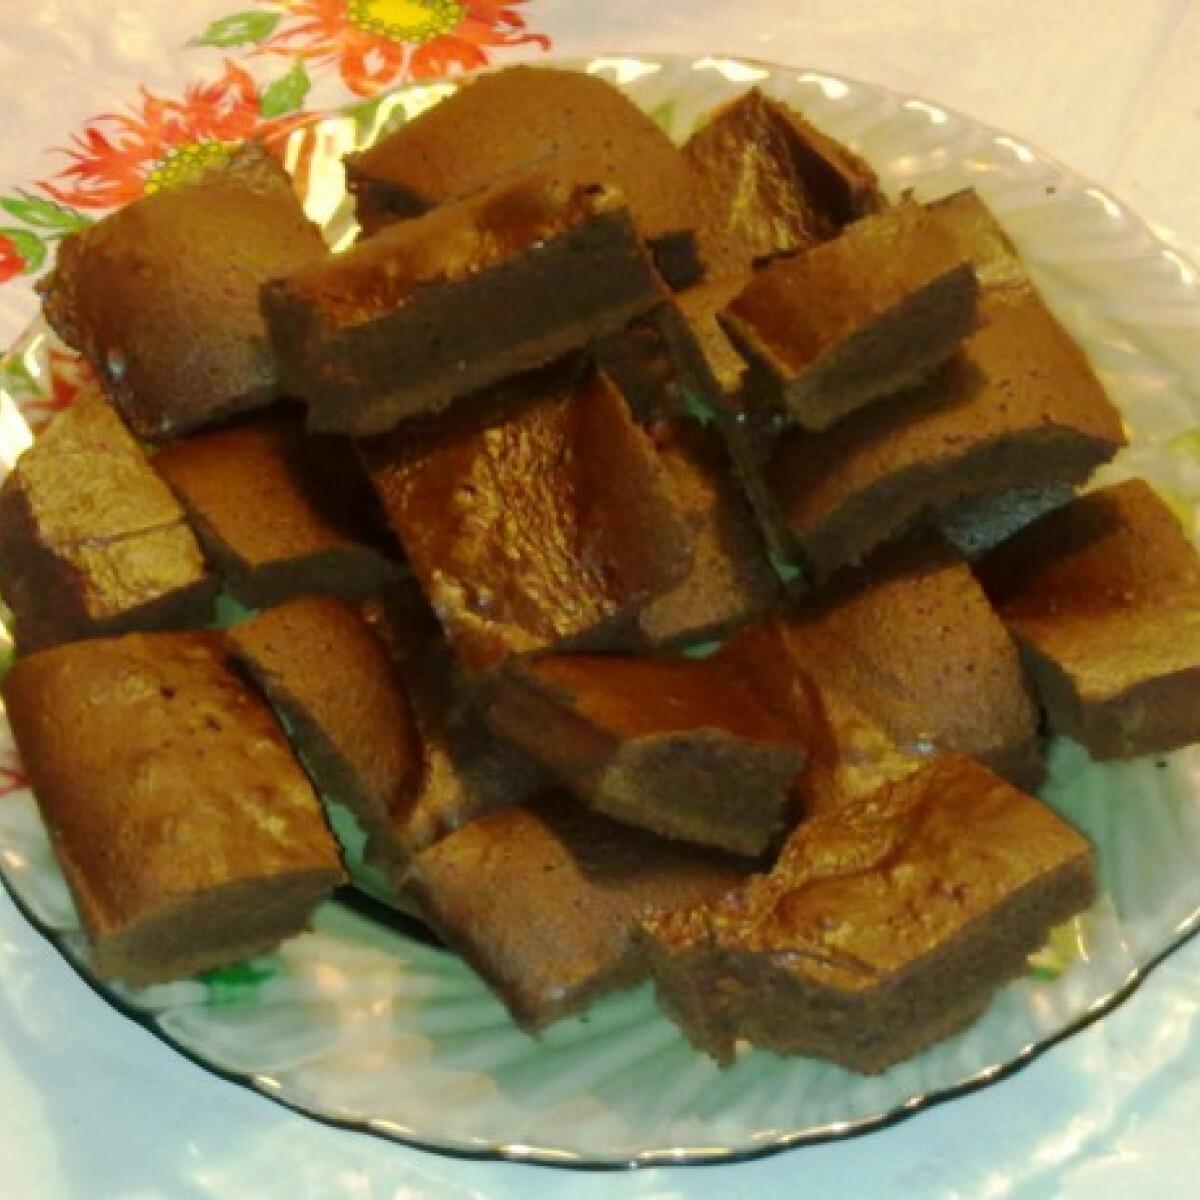 Kakaós kávés brownie